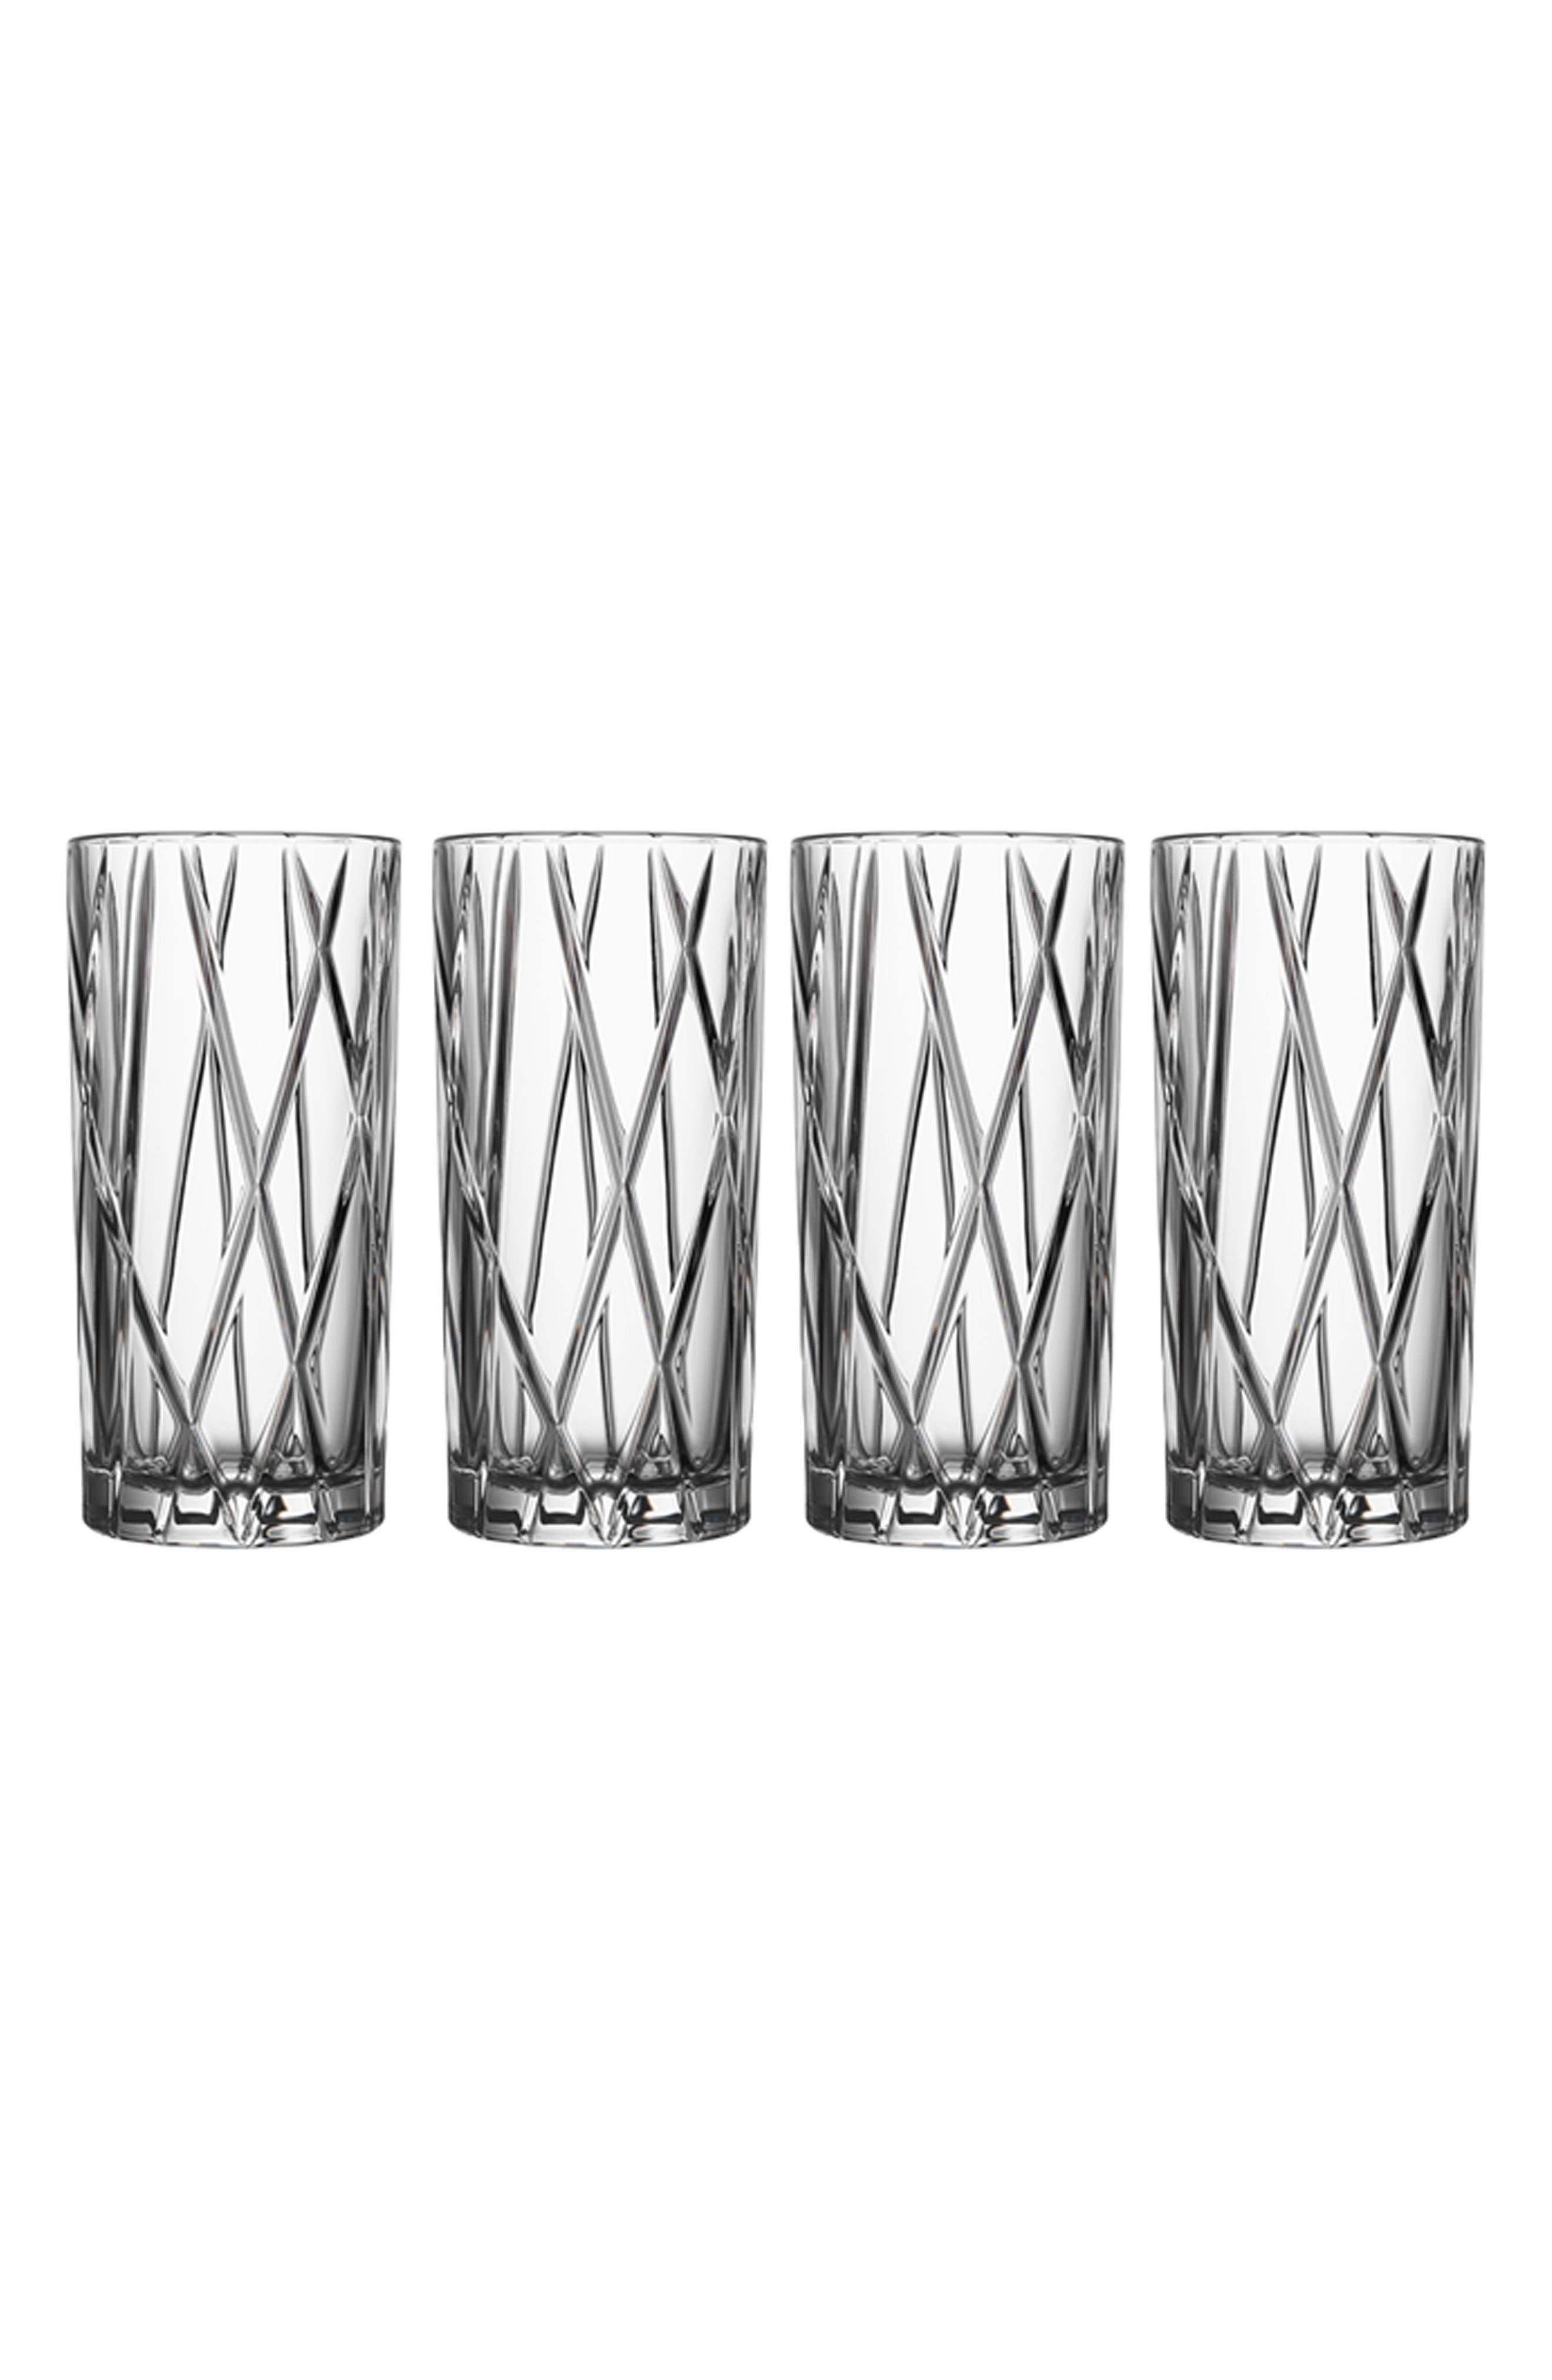 City Set of 4 Crystal Highball Glasses,                         Main,                         color, 100